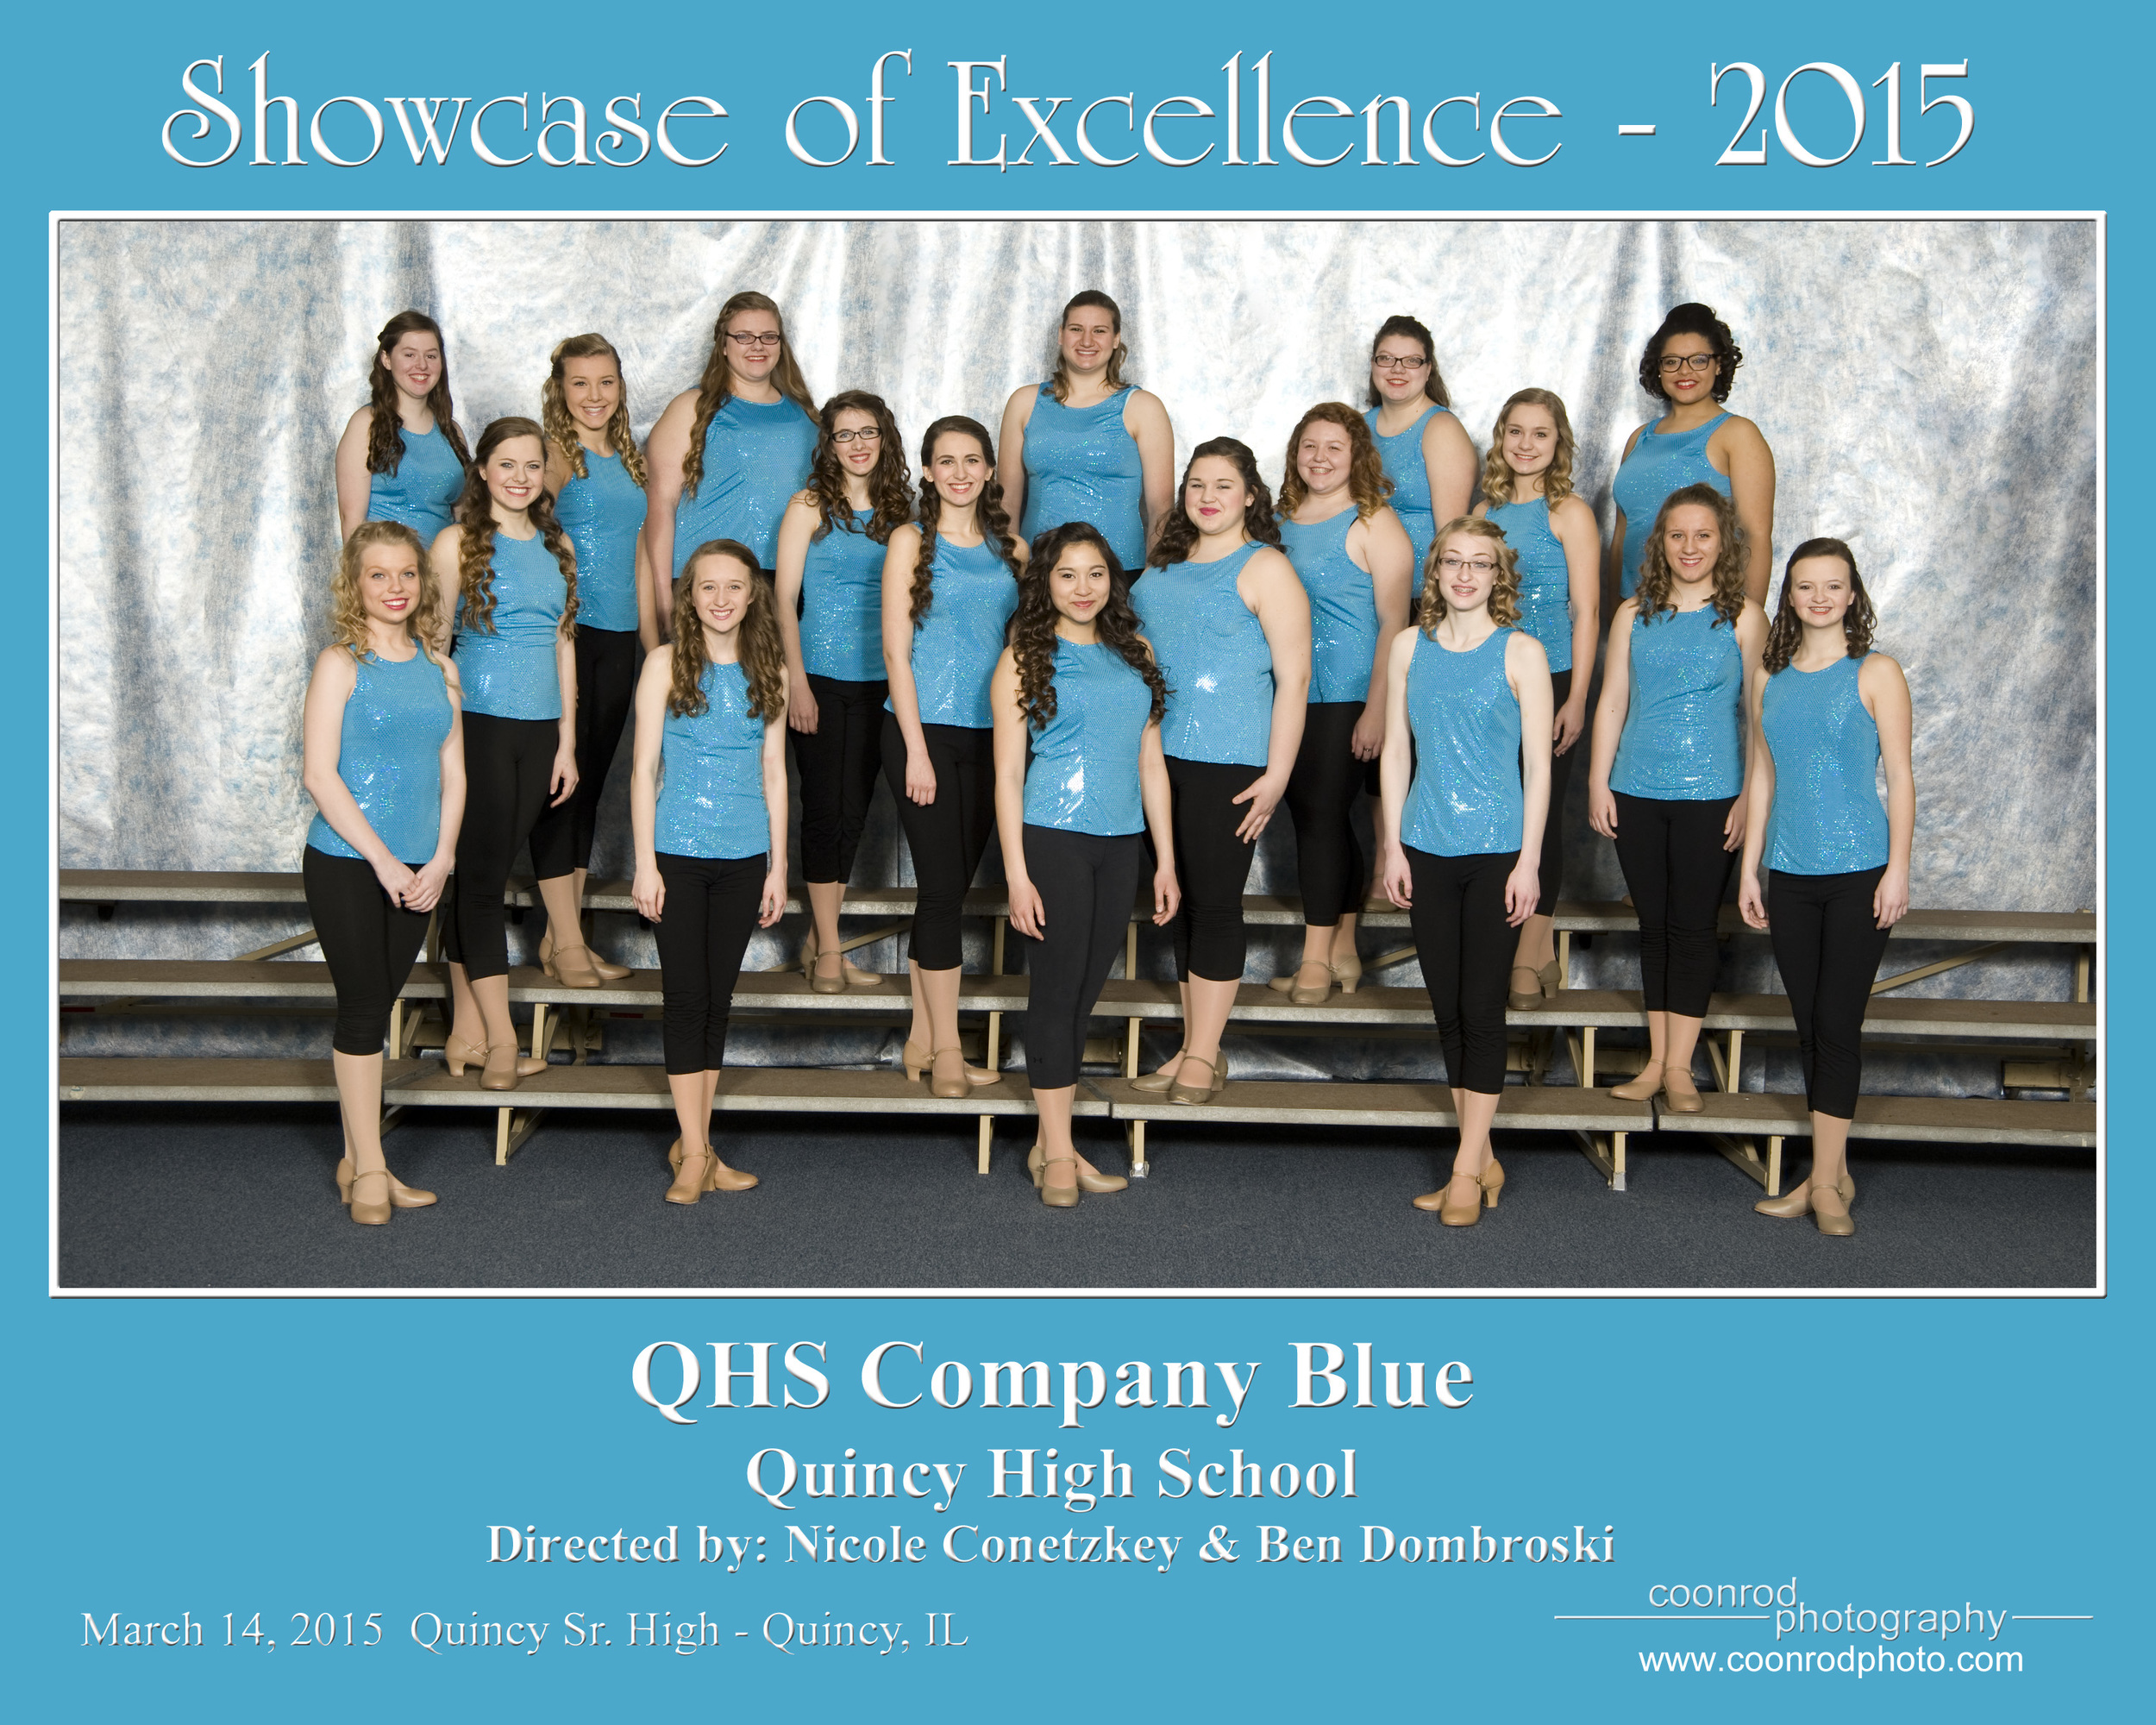 01 QHS Company Blue.jpg